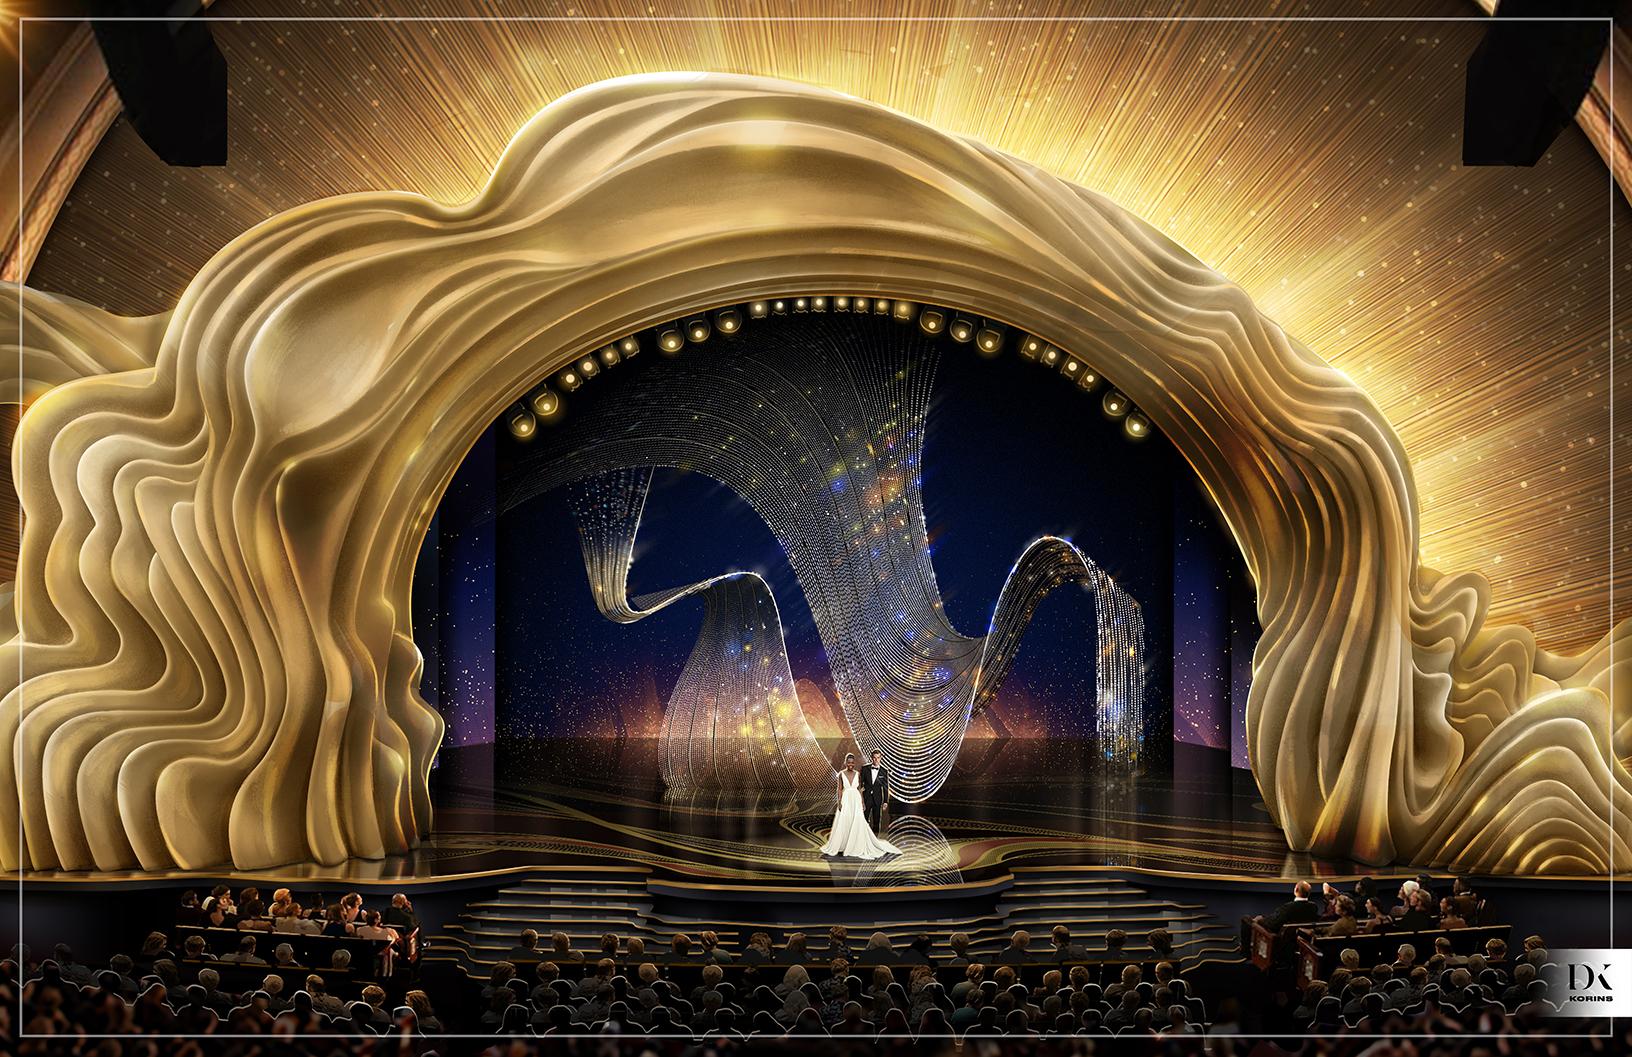 2019 Oscars stage design rendering